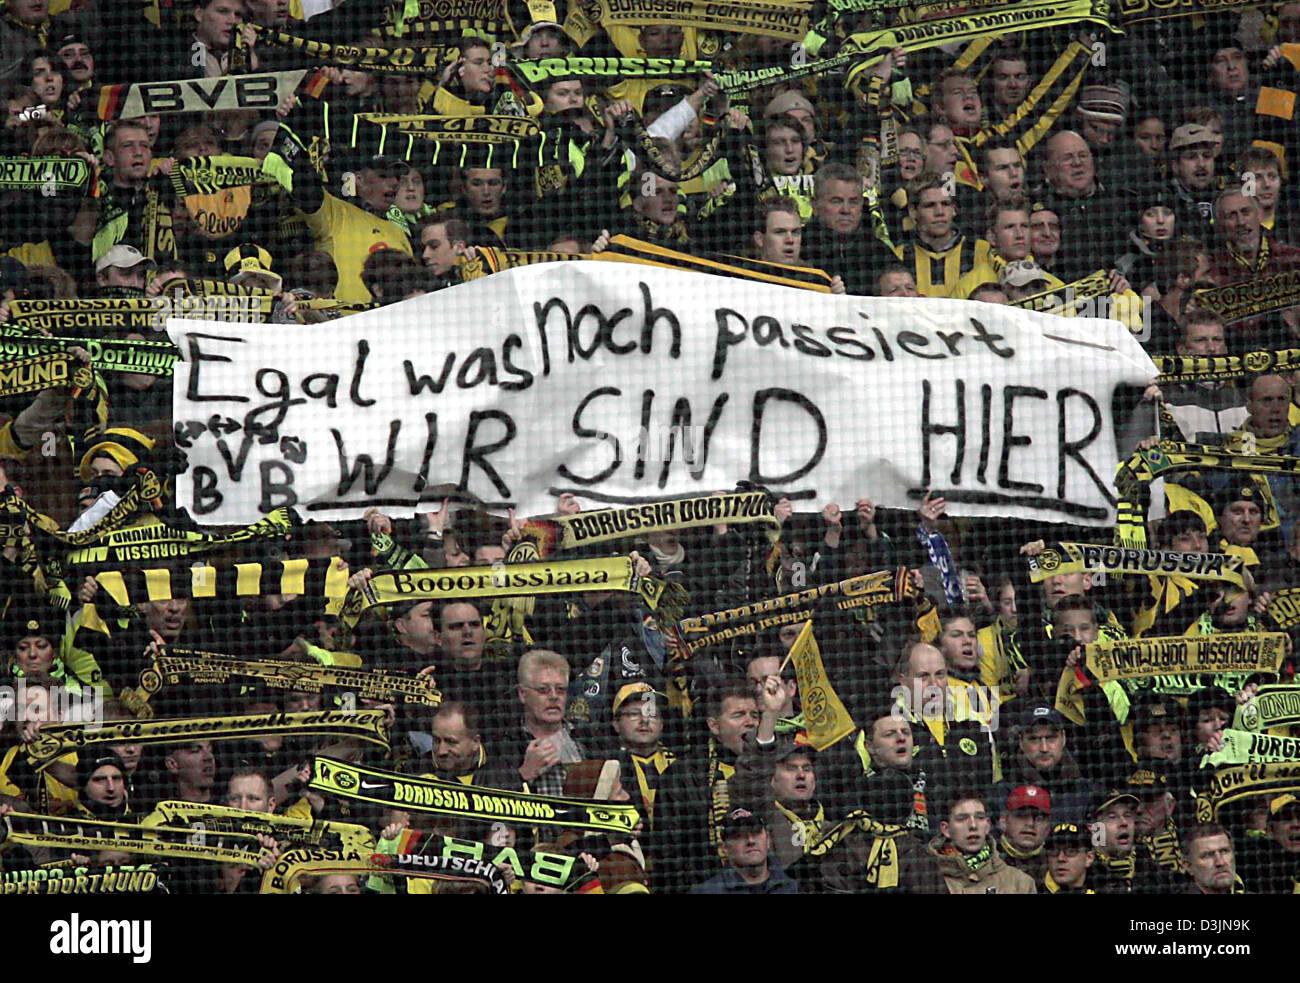 Dpa Fans Of The Bundesliga Soccer Club Borussia Dortmund Show A Stock Photo Alamy